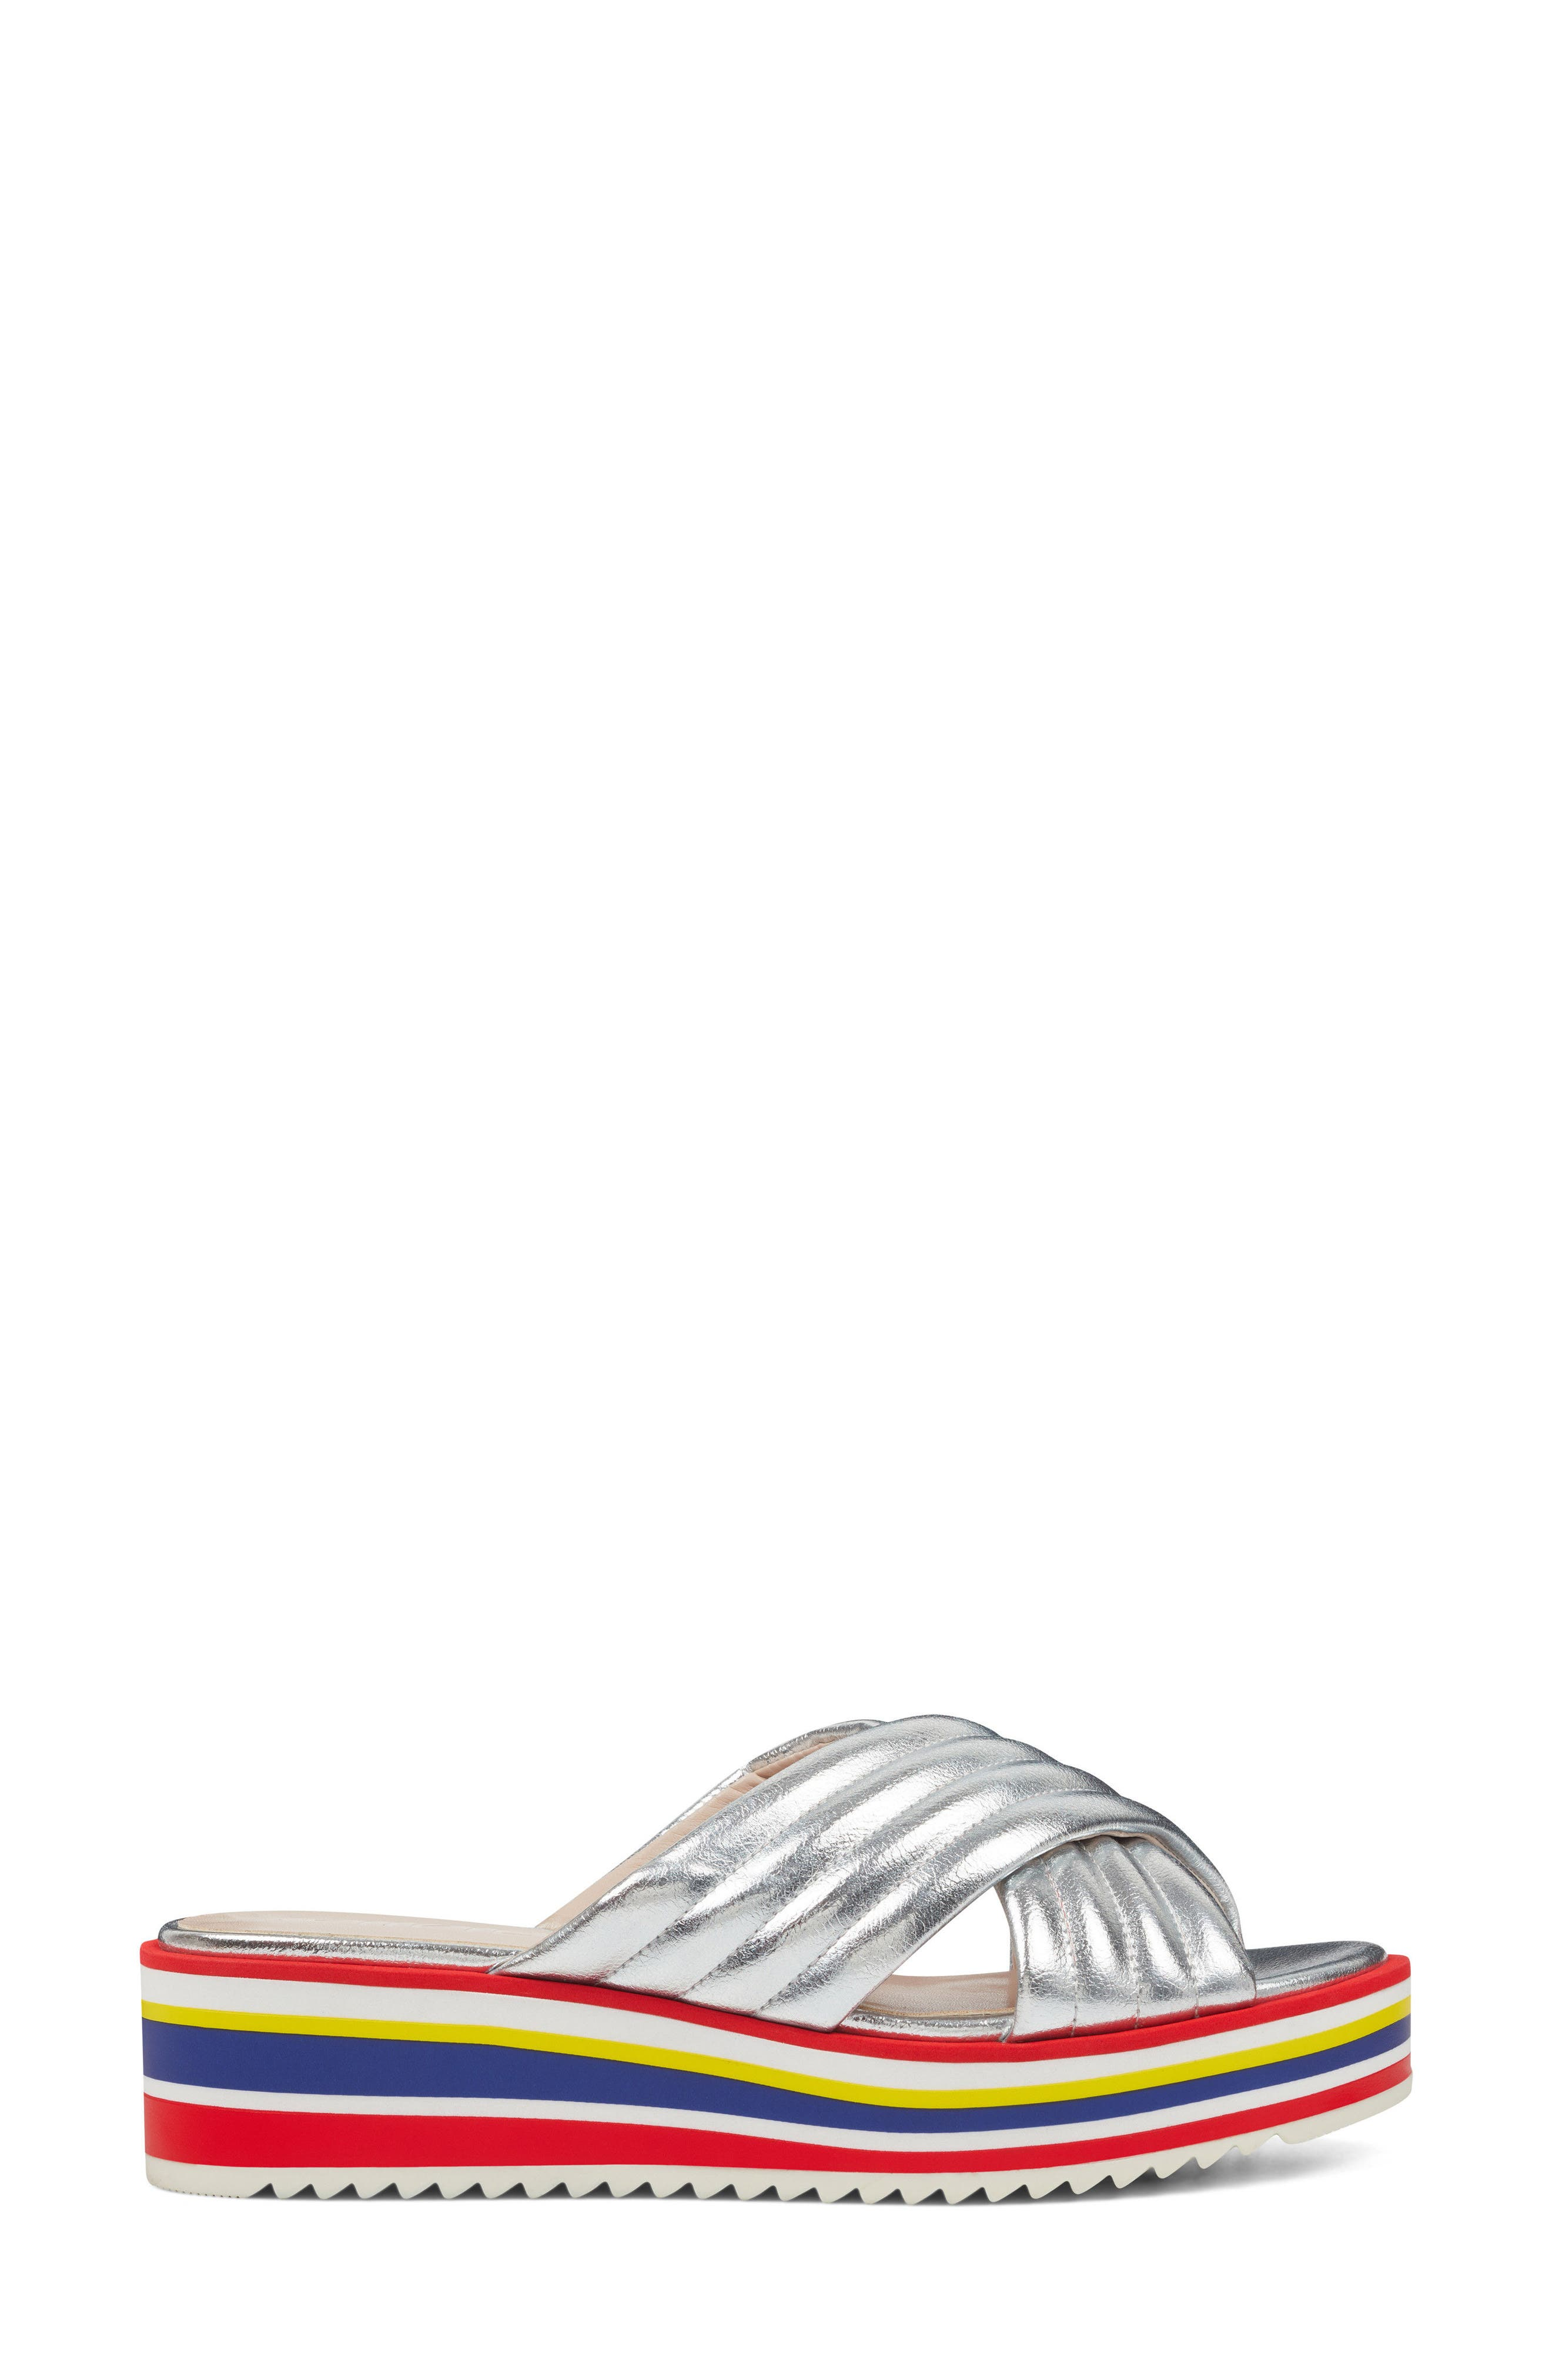 Zonita Platform Slide Sandal,                             Alternate thumbnail 3, color,                             Silver Faux Leather